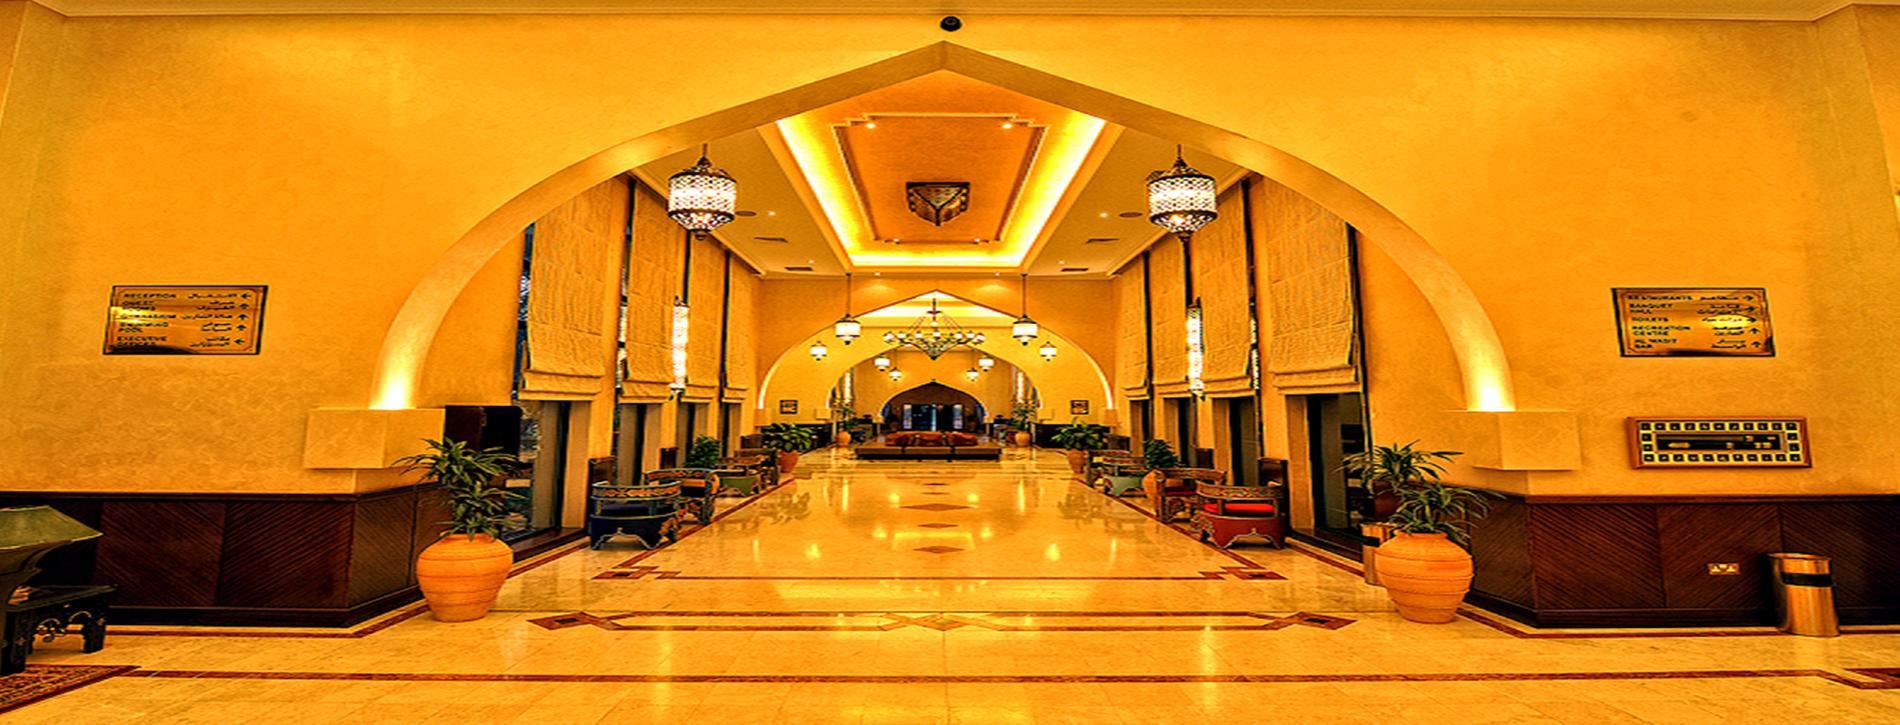 Golden tulip hotel & casino opus casino cruise freeport ny